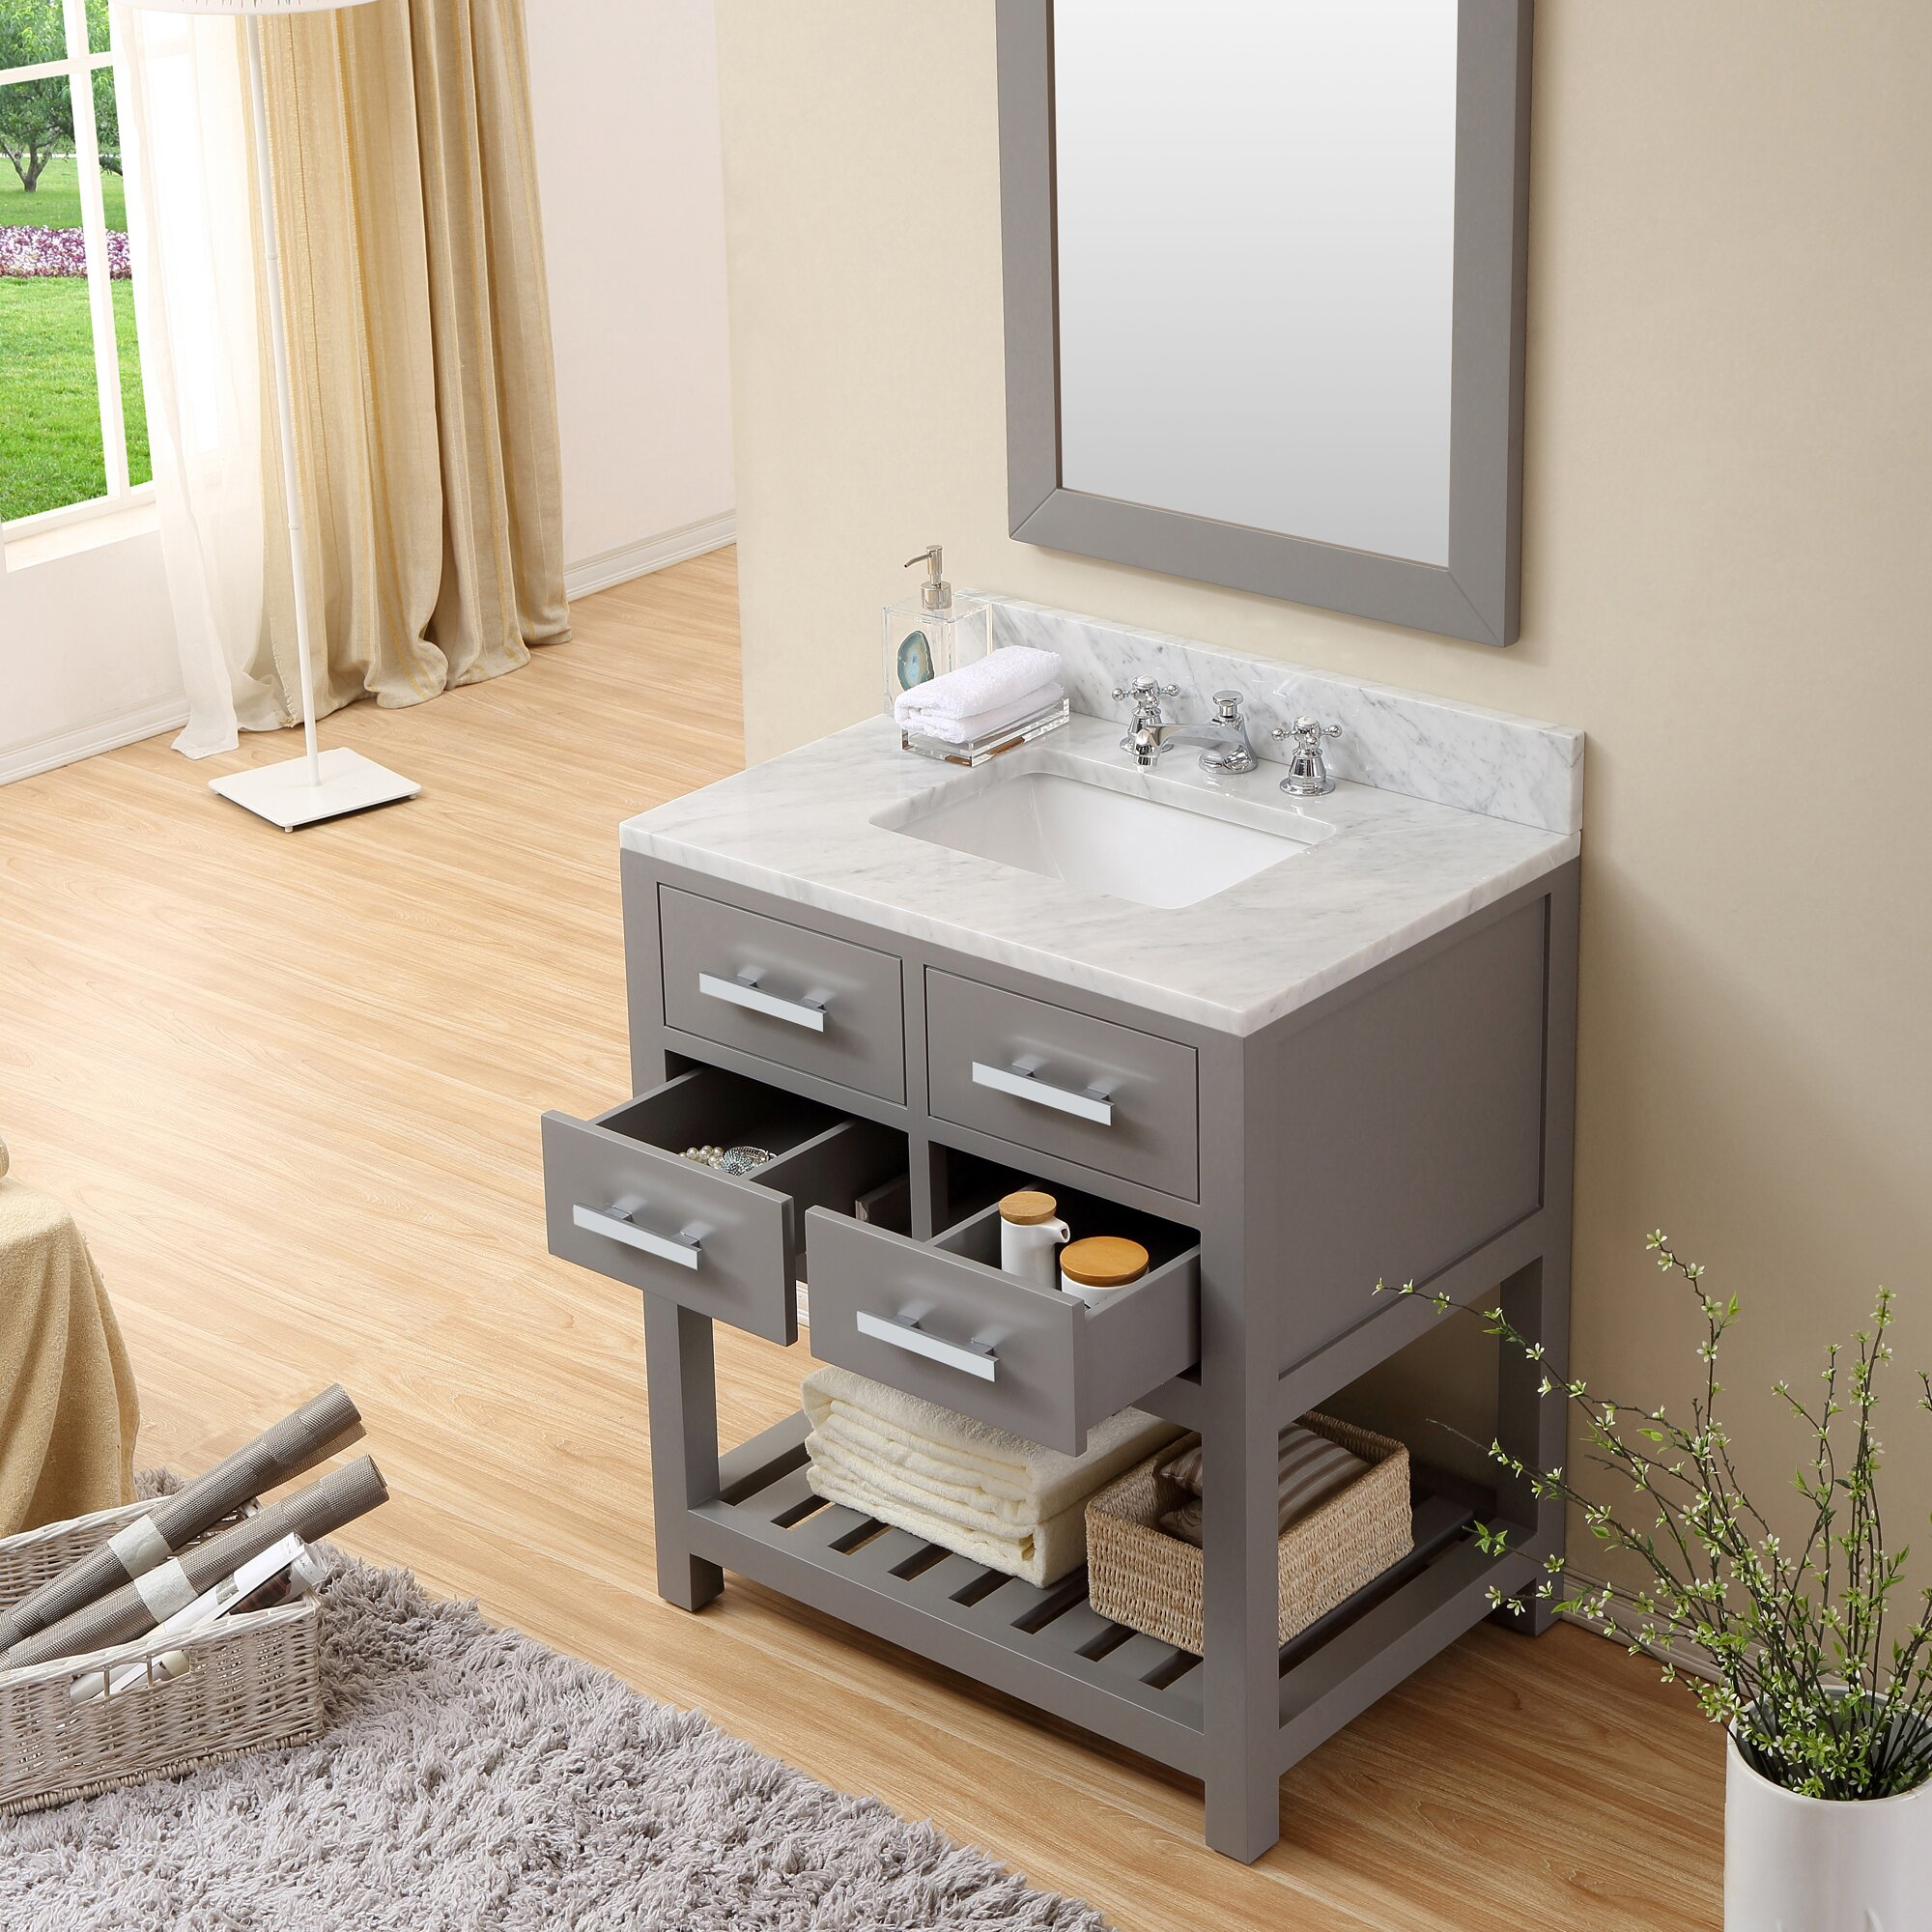 Dcor Design Creighton 30 Single Sink Bathroom Vanity Set